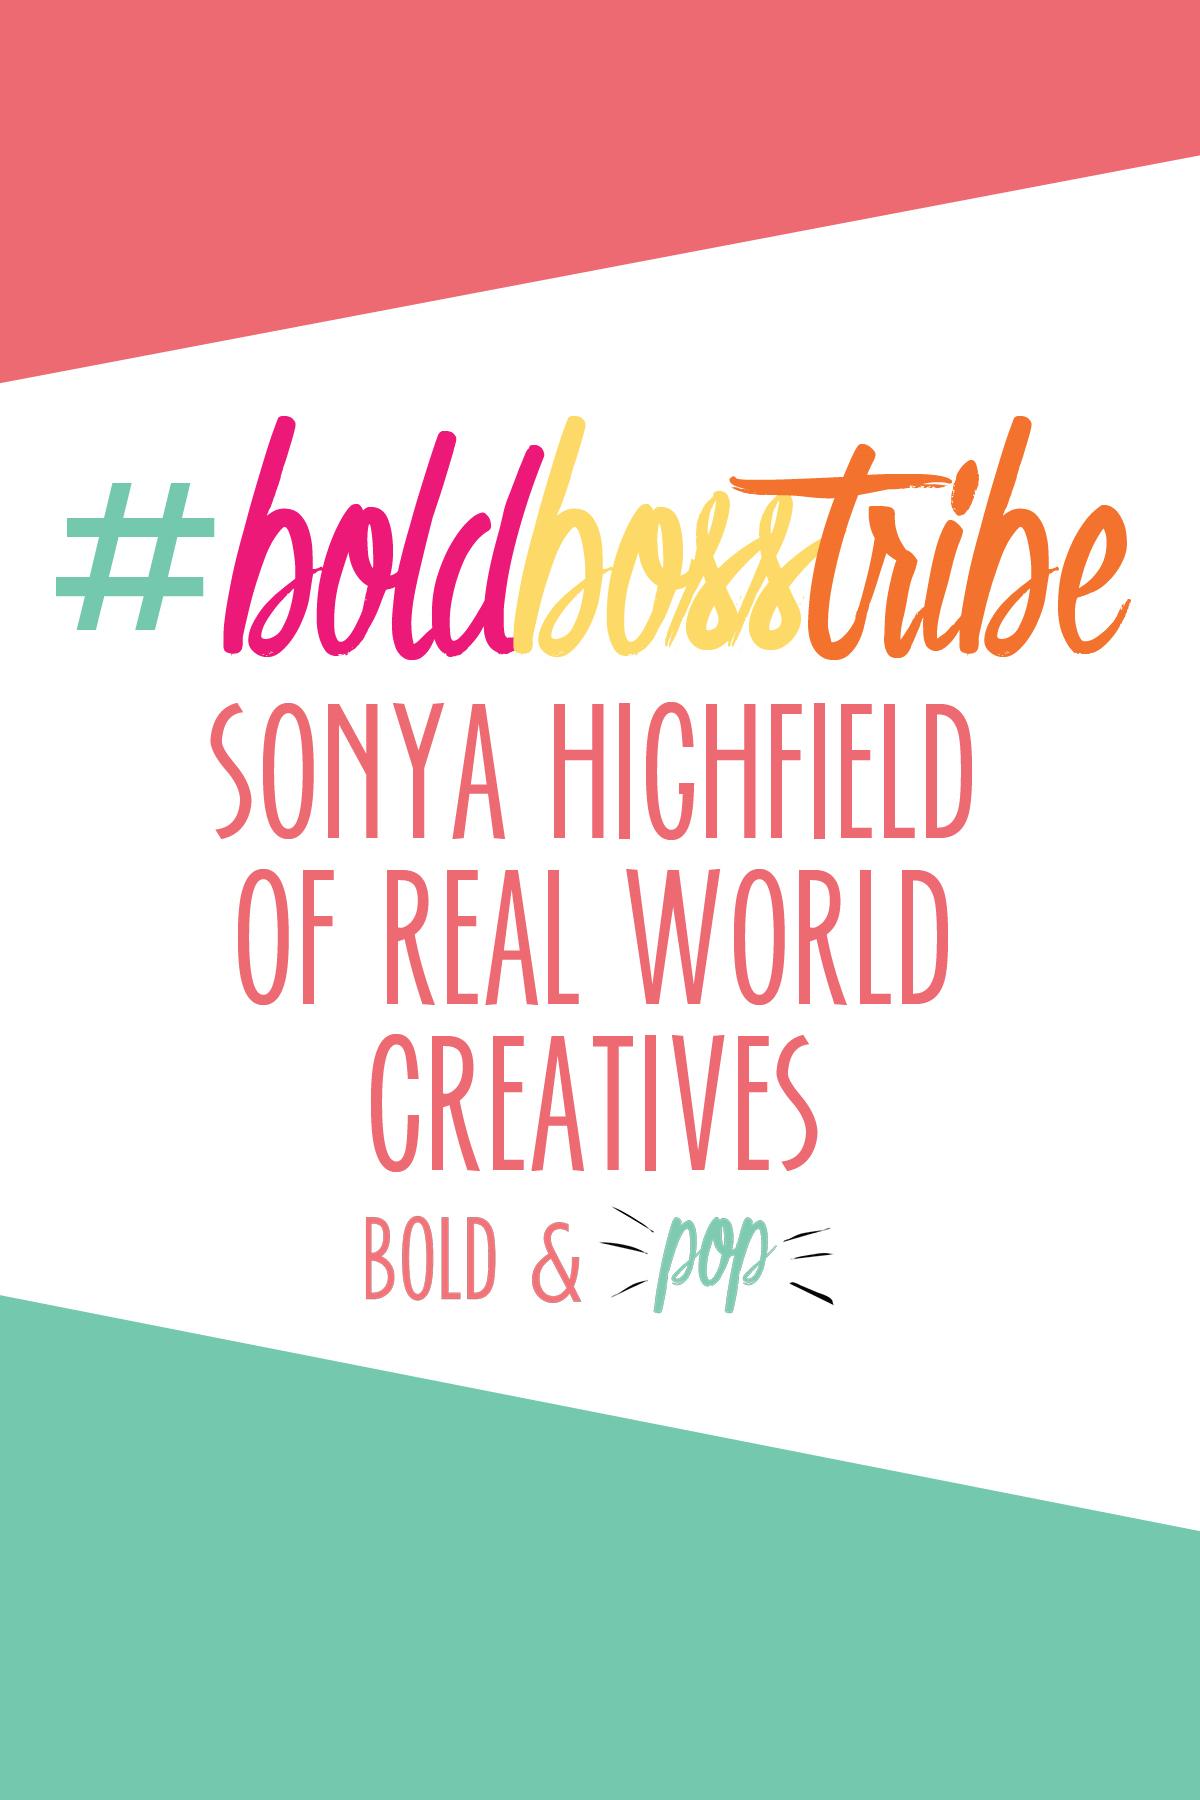 Bold & Pop : #BoldBossTribe :: #BoldBossTribe Feature with Sonya Highfield of Real World Creatives